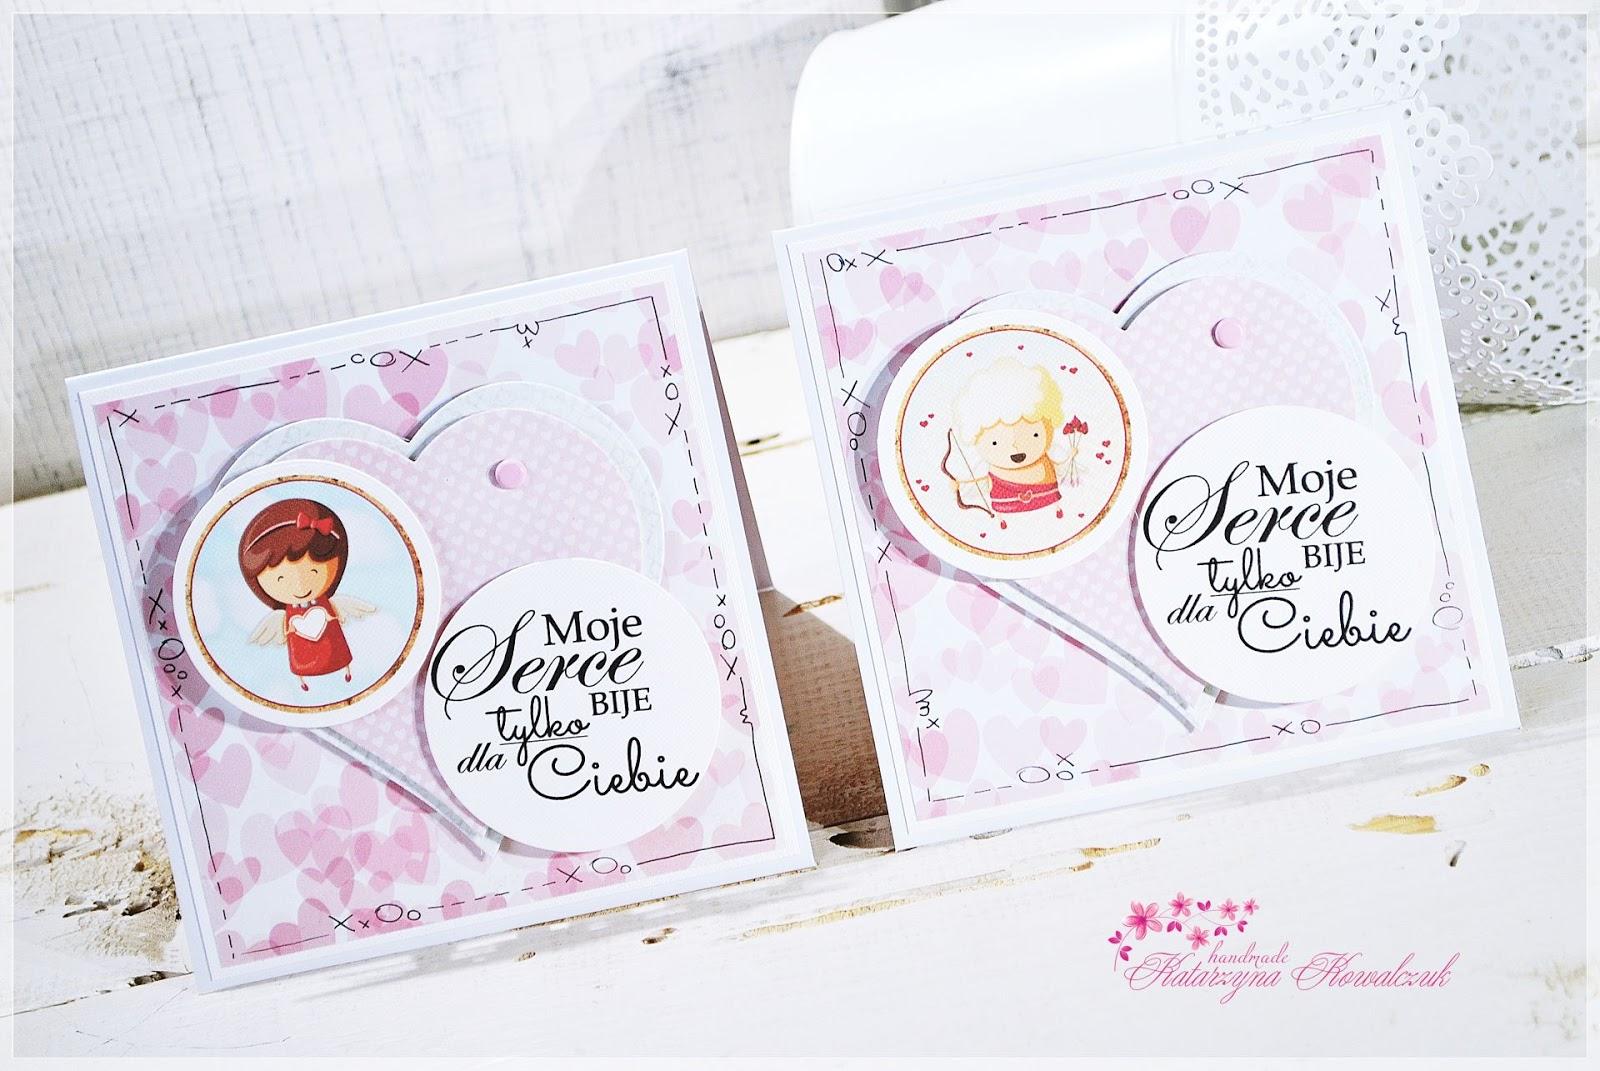 Kartka Walentynkowa scrapbooking